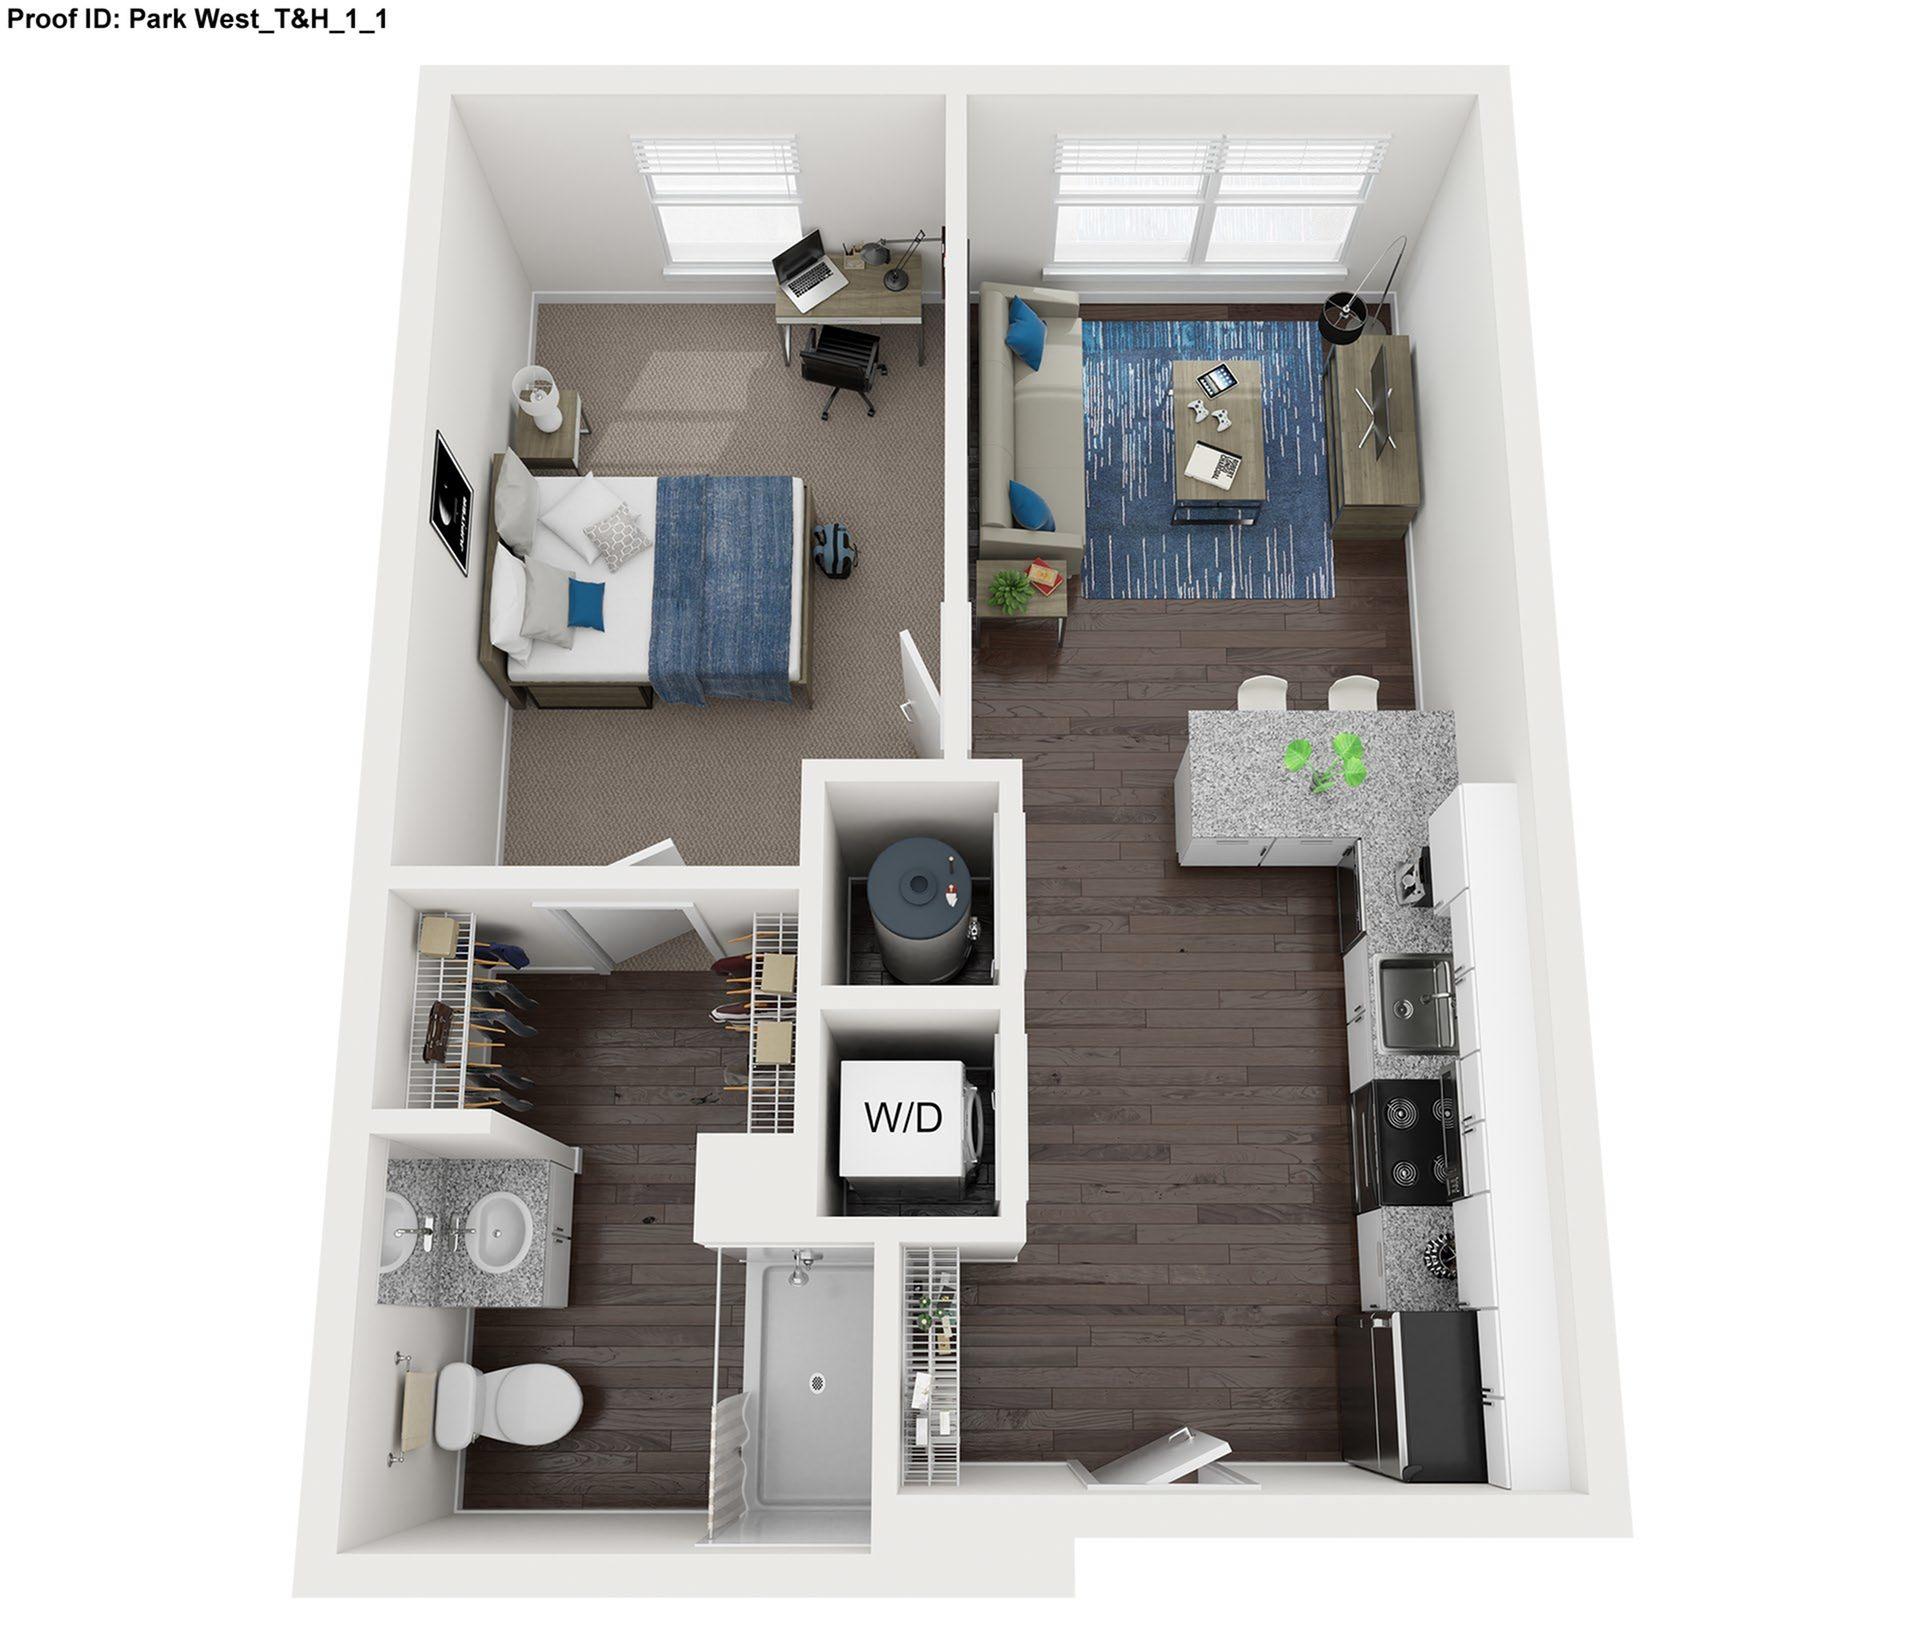 1 Bedroom 1 Bathroom Floor Plan  |  Park West  | Apartments In College Station, Texas